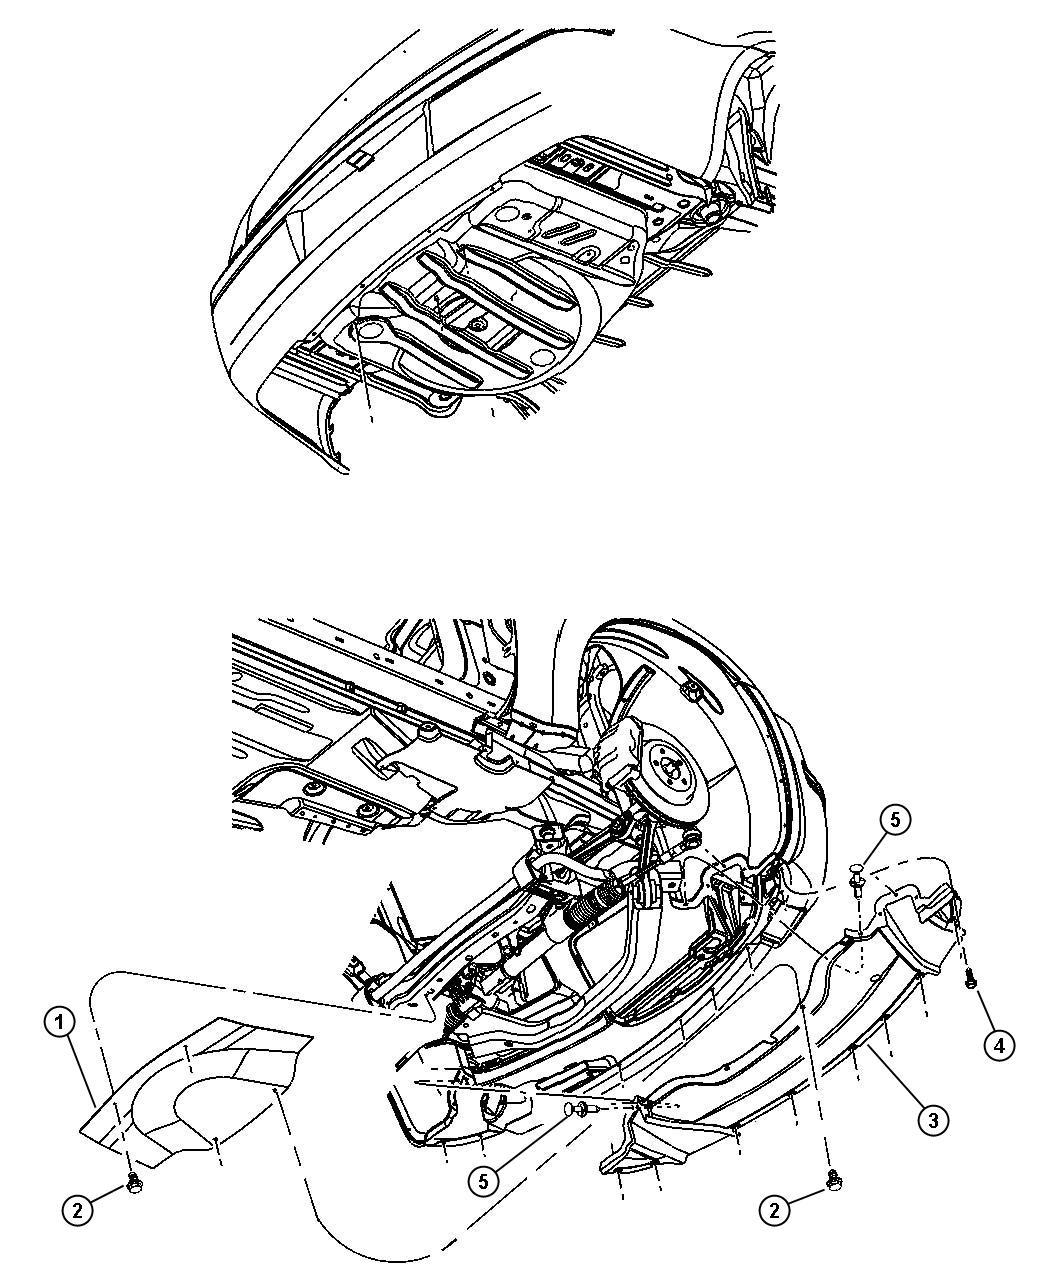 2010 Dodge Challenger R  T 5 7l Hemi V8 M  T Belly Pan